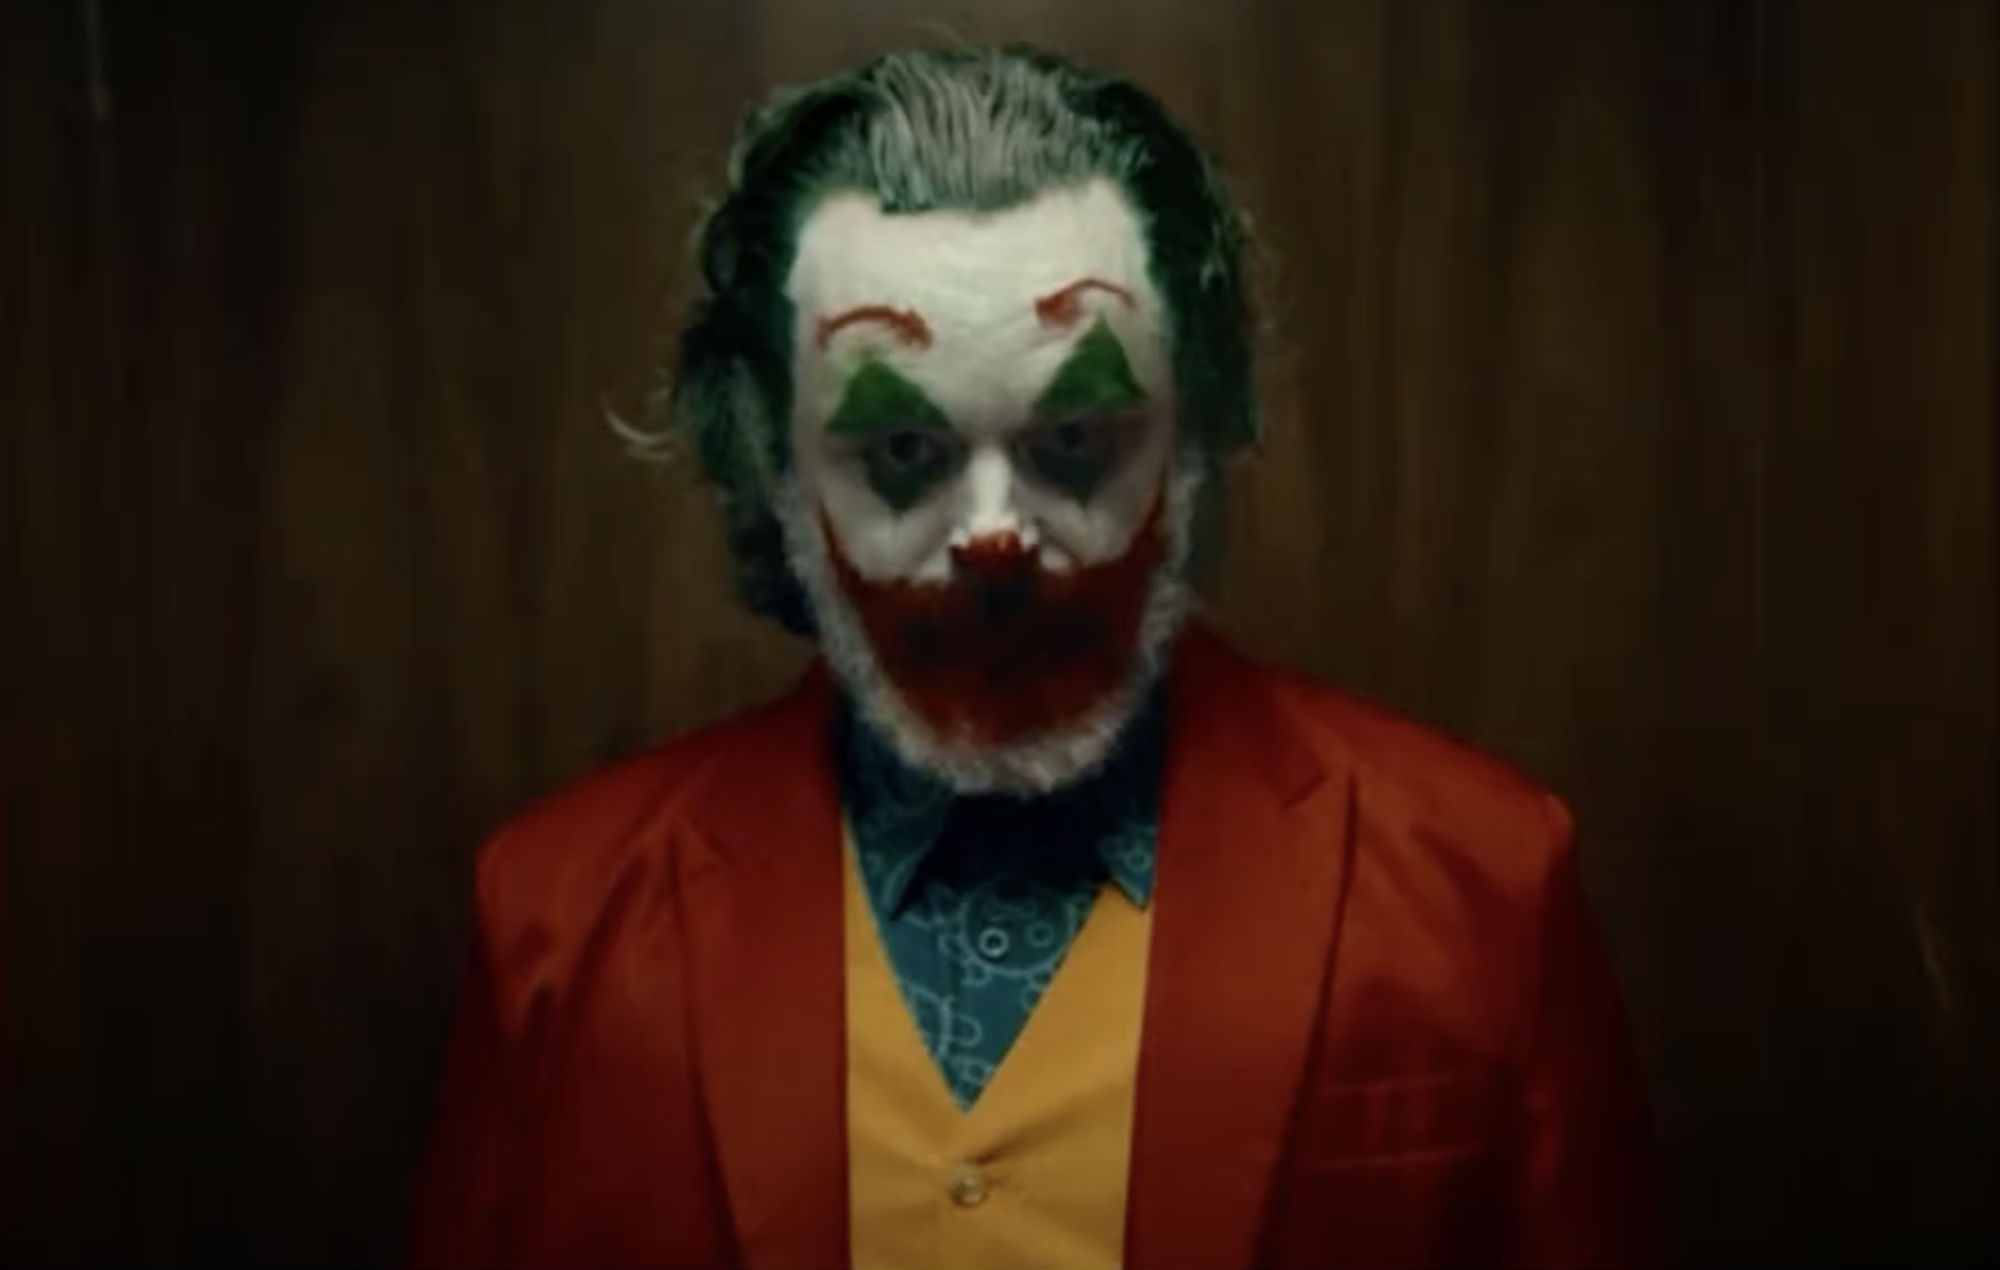 Watch Michael Sheen transform into Joaquin Phoenix's Joker